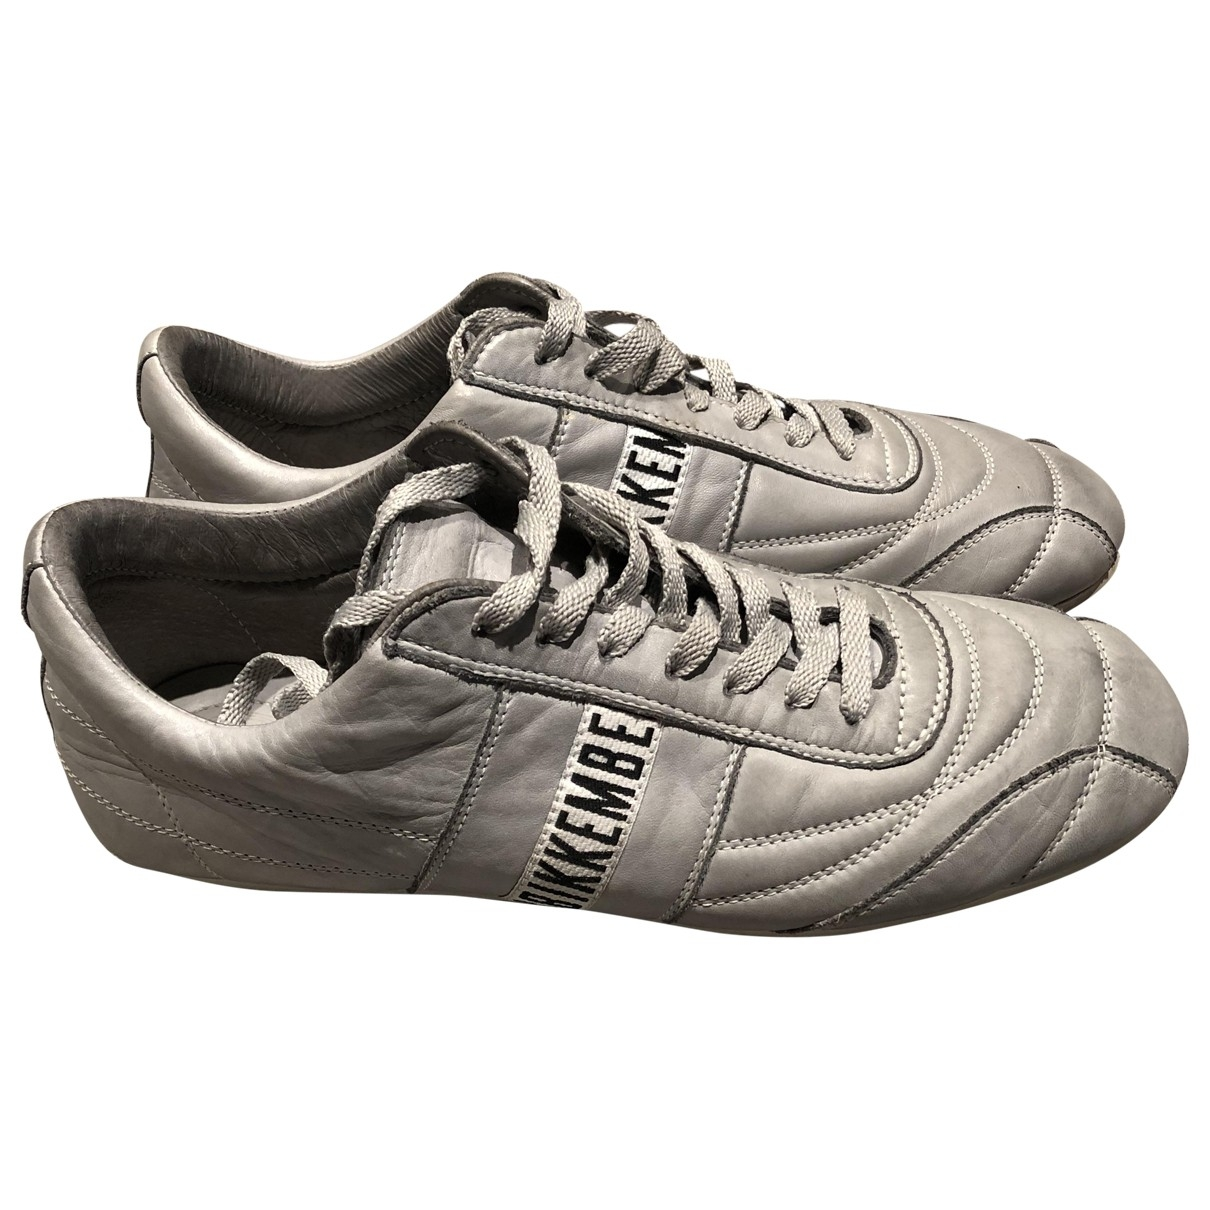 Dirk Bikkembergs - Baskets   pour homme en cuir - gris